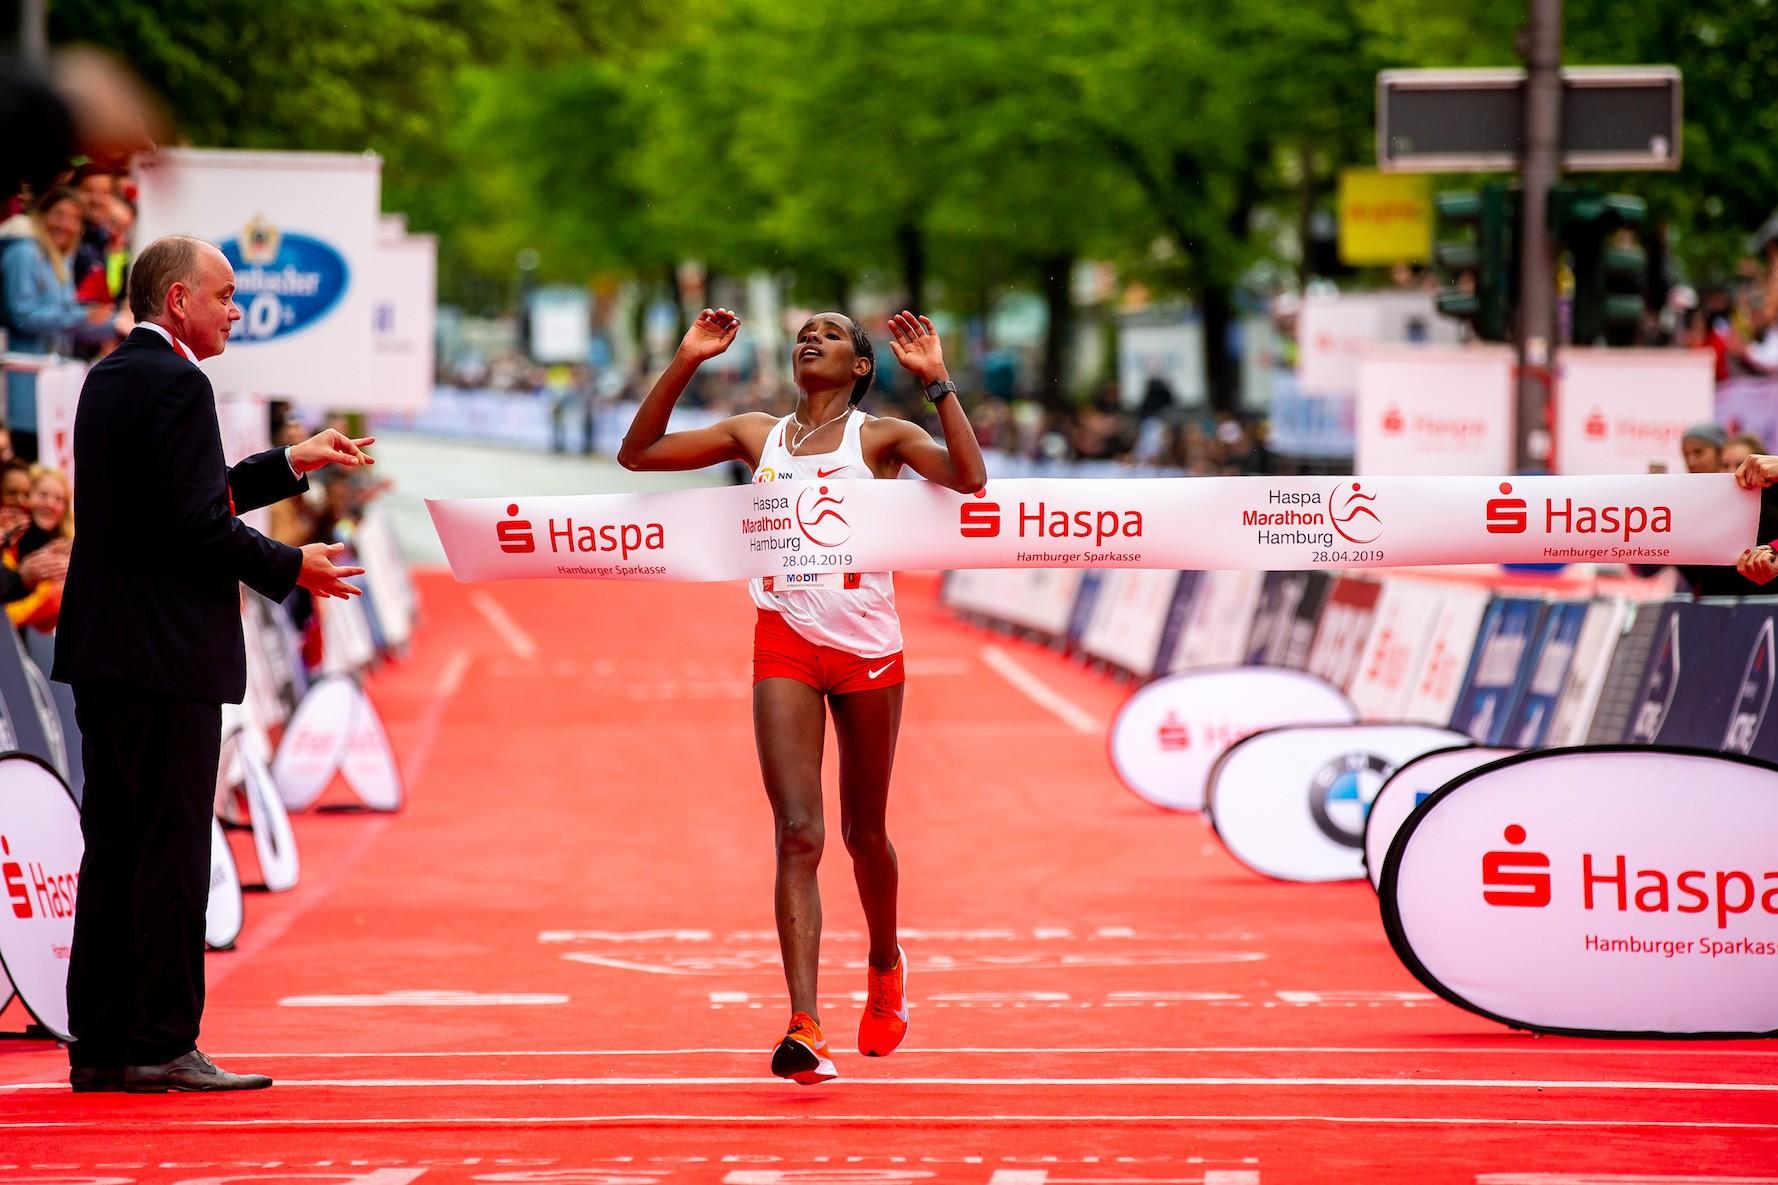 34. Haspa Marathon Hamburg 2019, Siegerinn Dibabe Kuma (ETH) / Photo Credit: Philipp Szyza / HOCH ZWEI